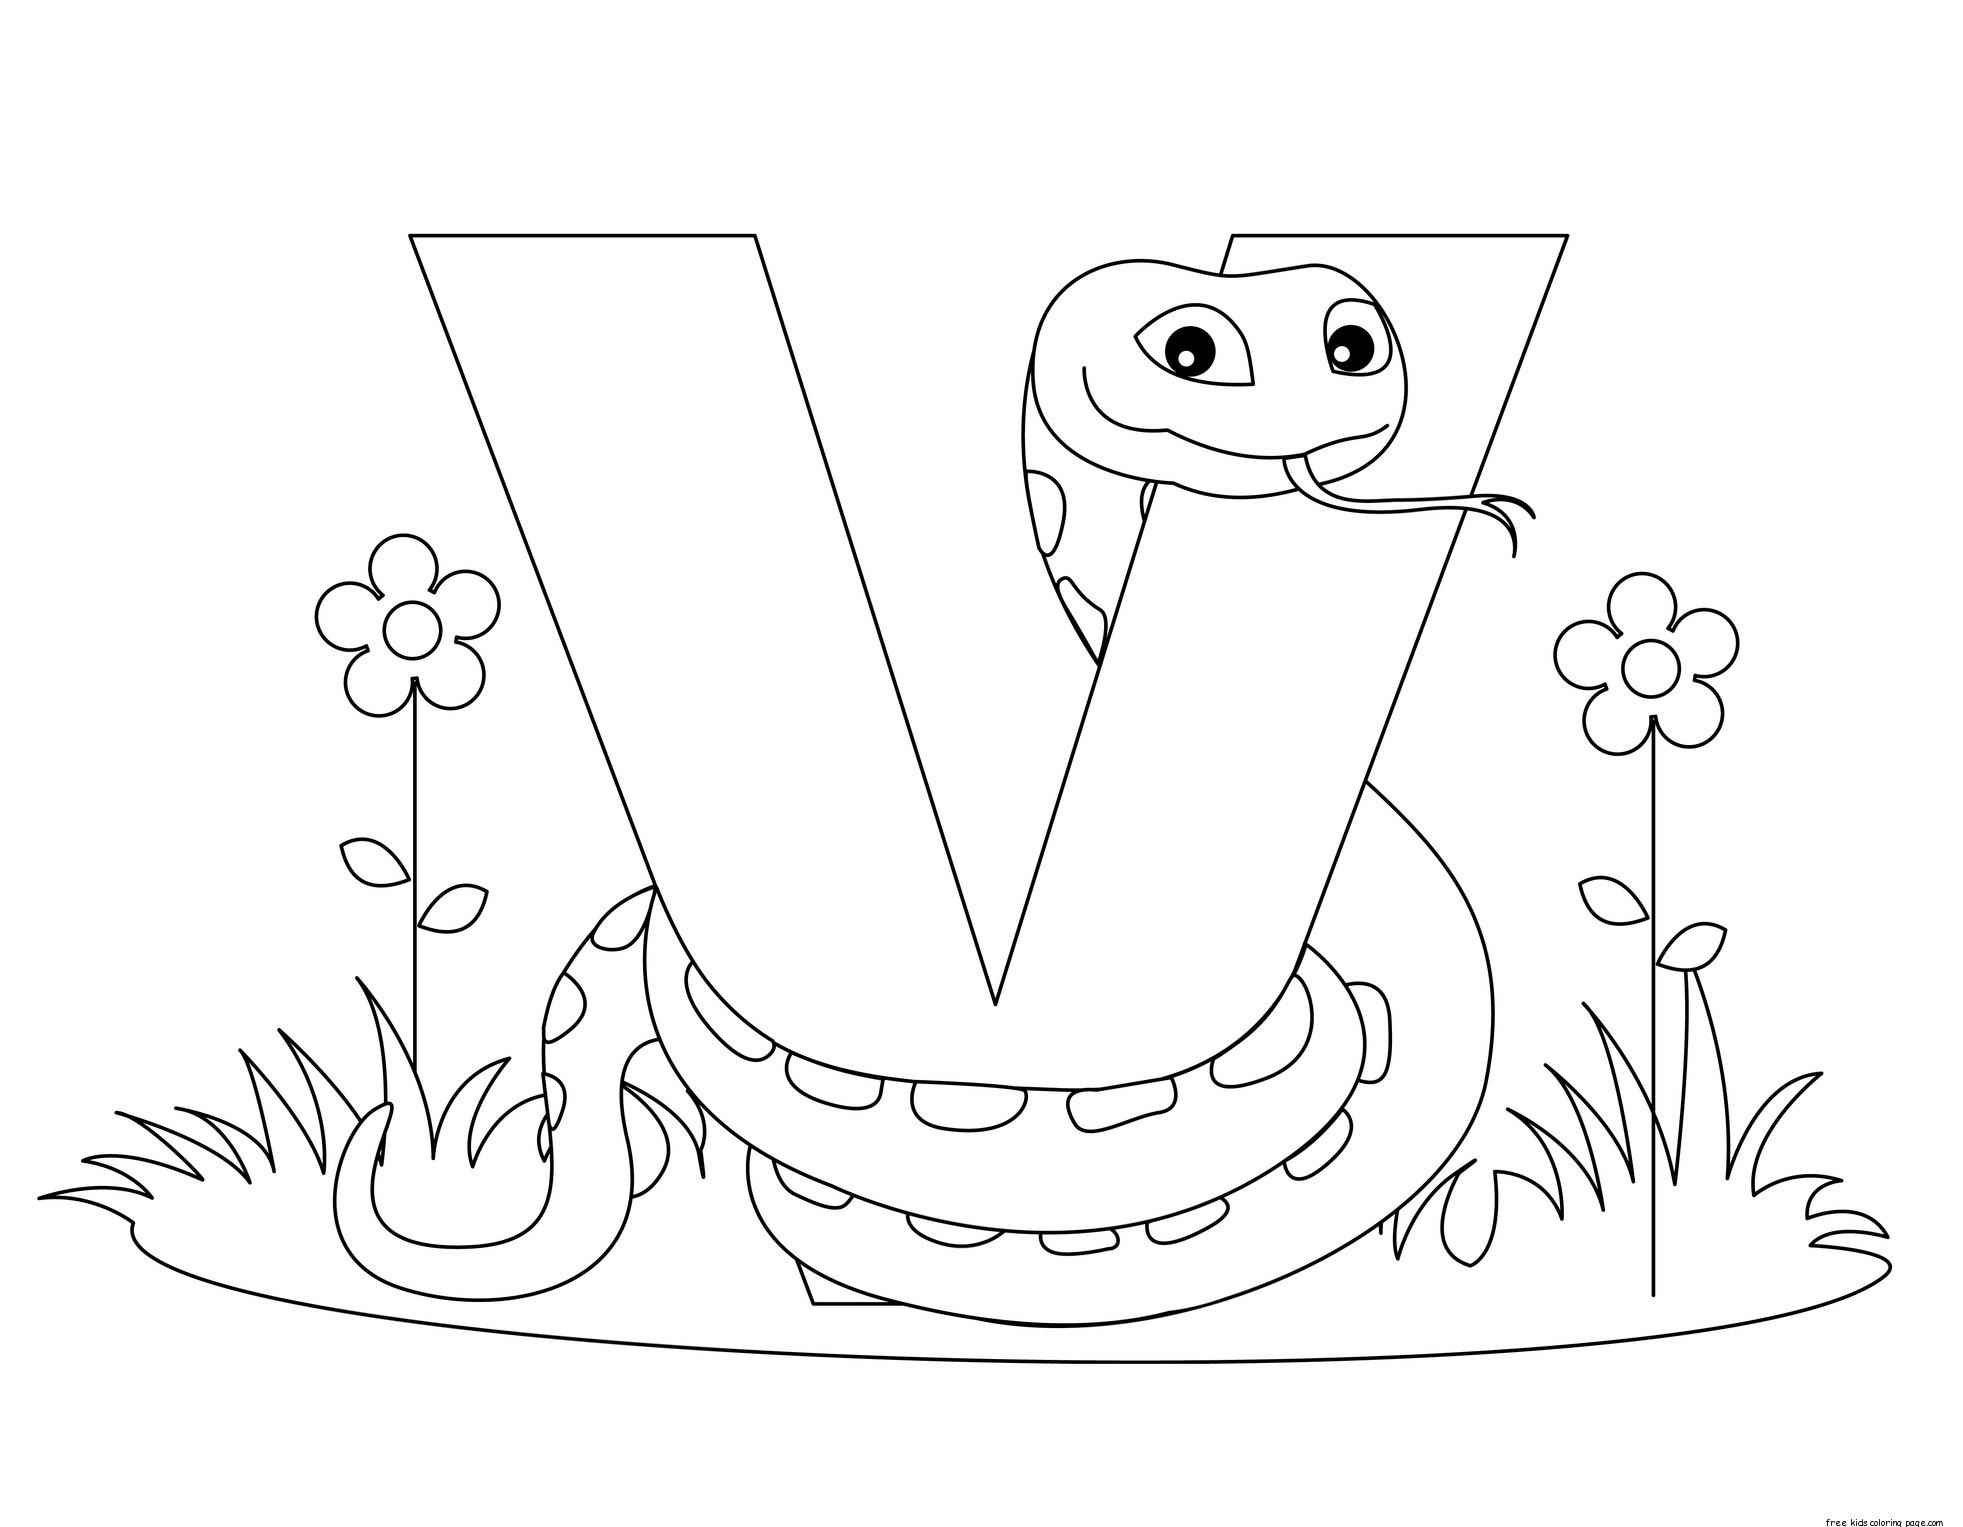 Printable Traceable Alphabet Letter V Worksheet For